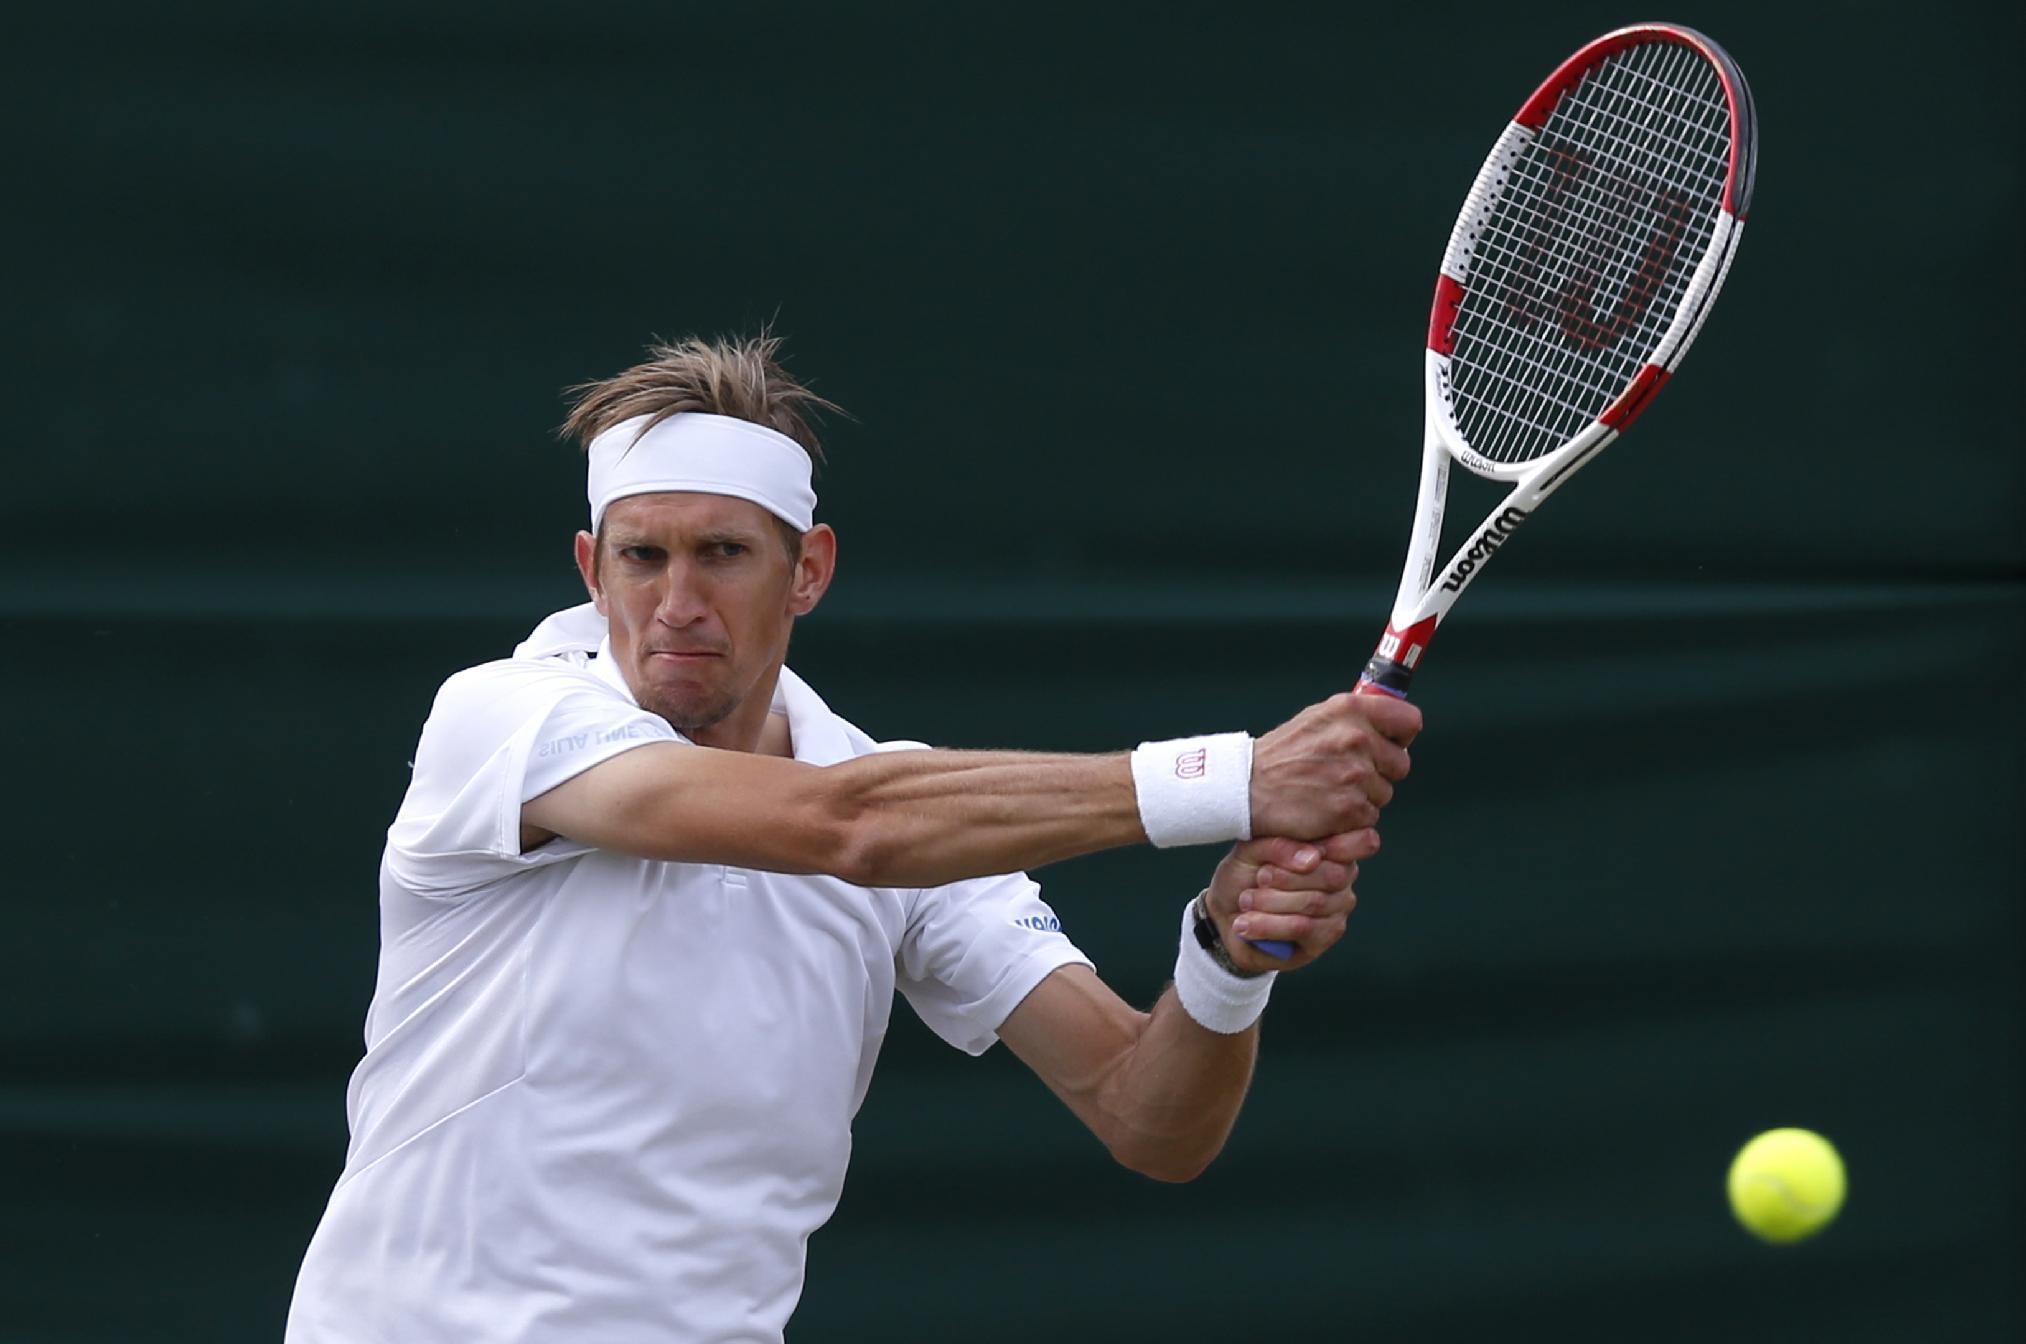 Isner takes 19-17 tiebreaker, wins at Wimbledon